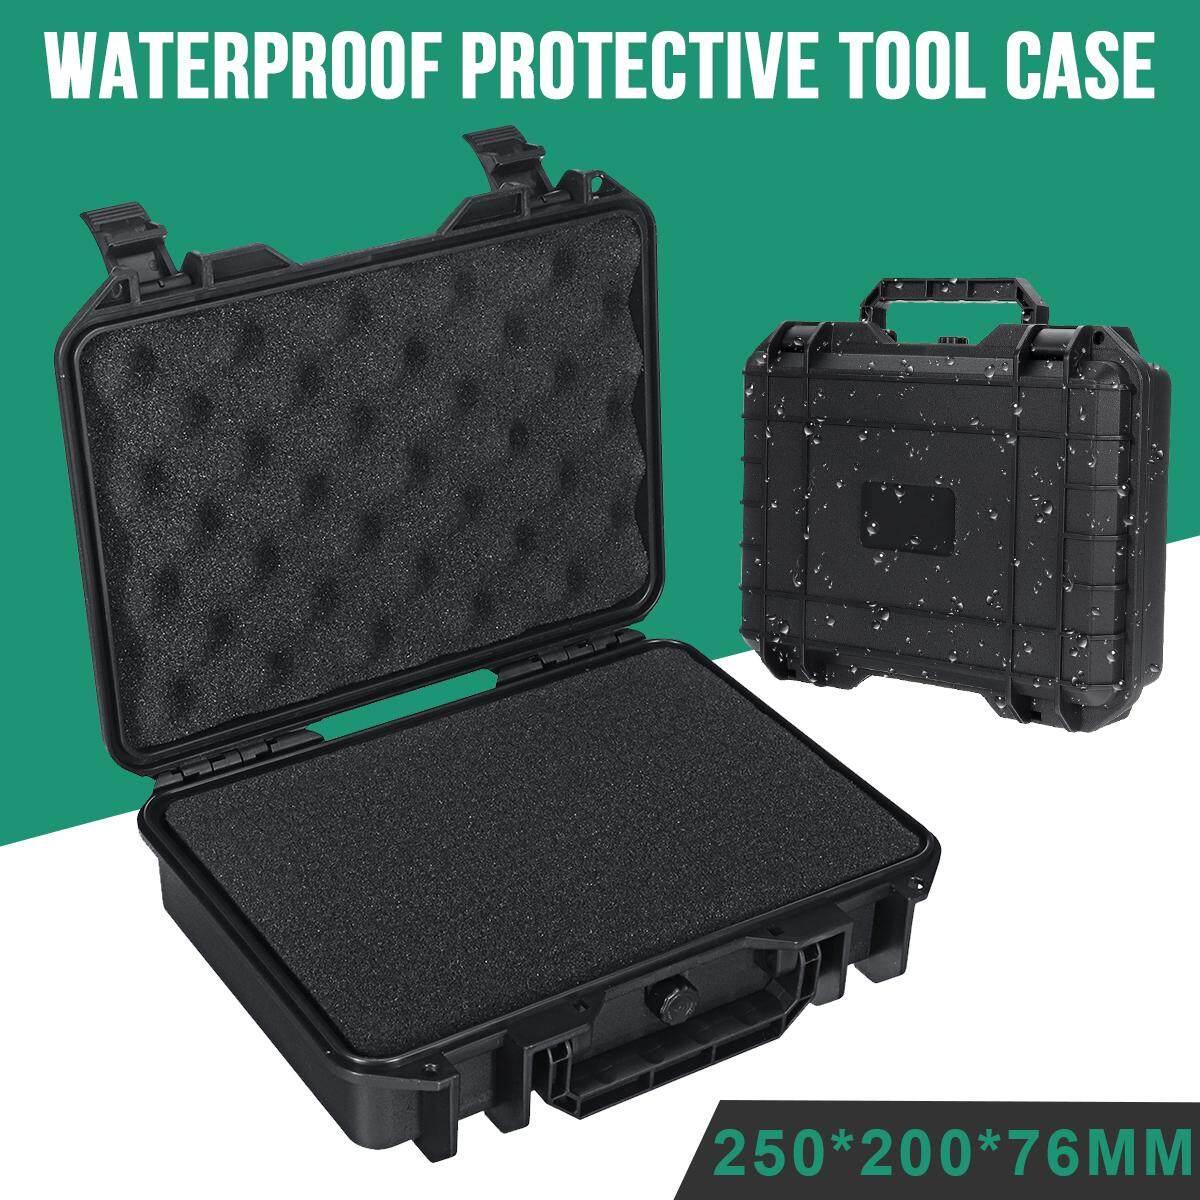 Waterproof Hard Carry Flight Case Bag Camera Photography Storage Box+Free Form Portable Anti-proof Organizer